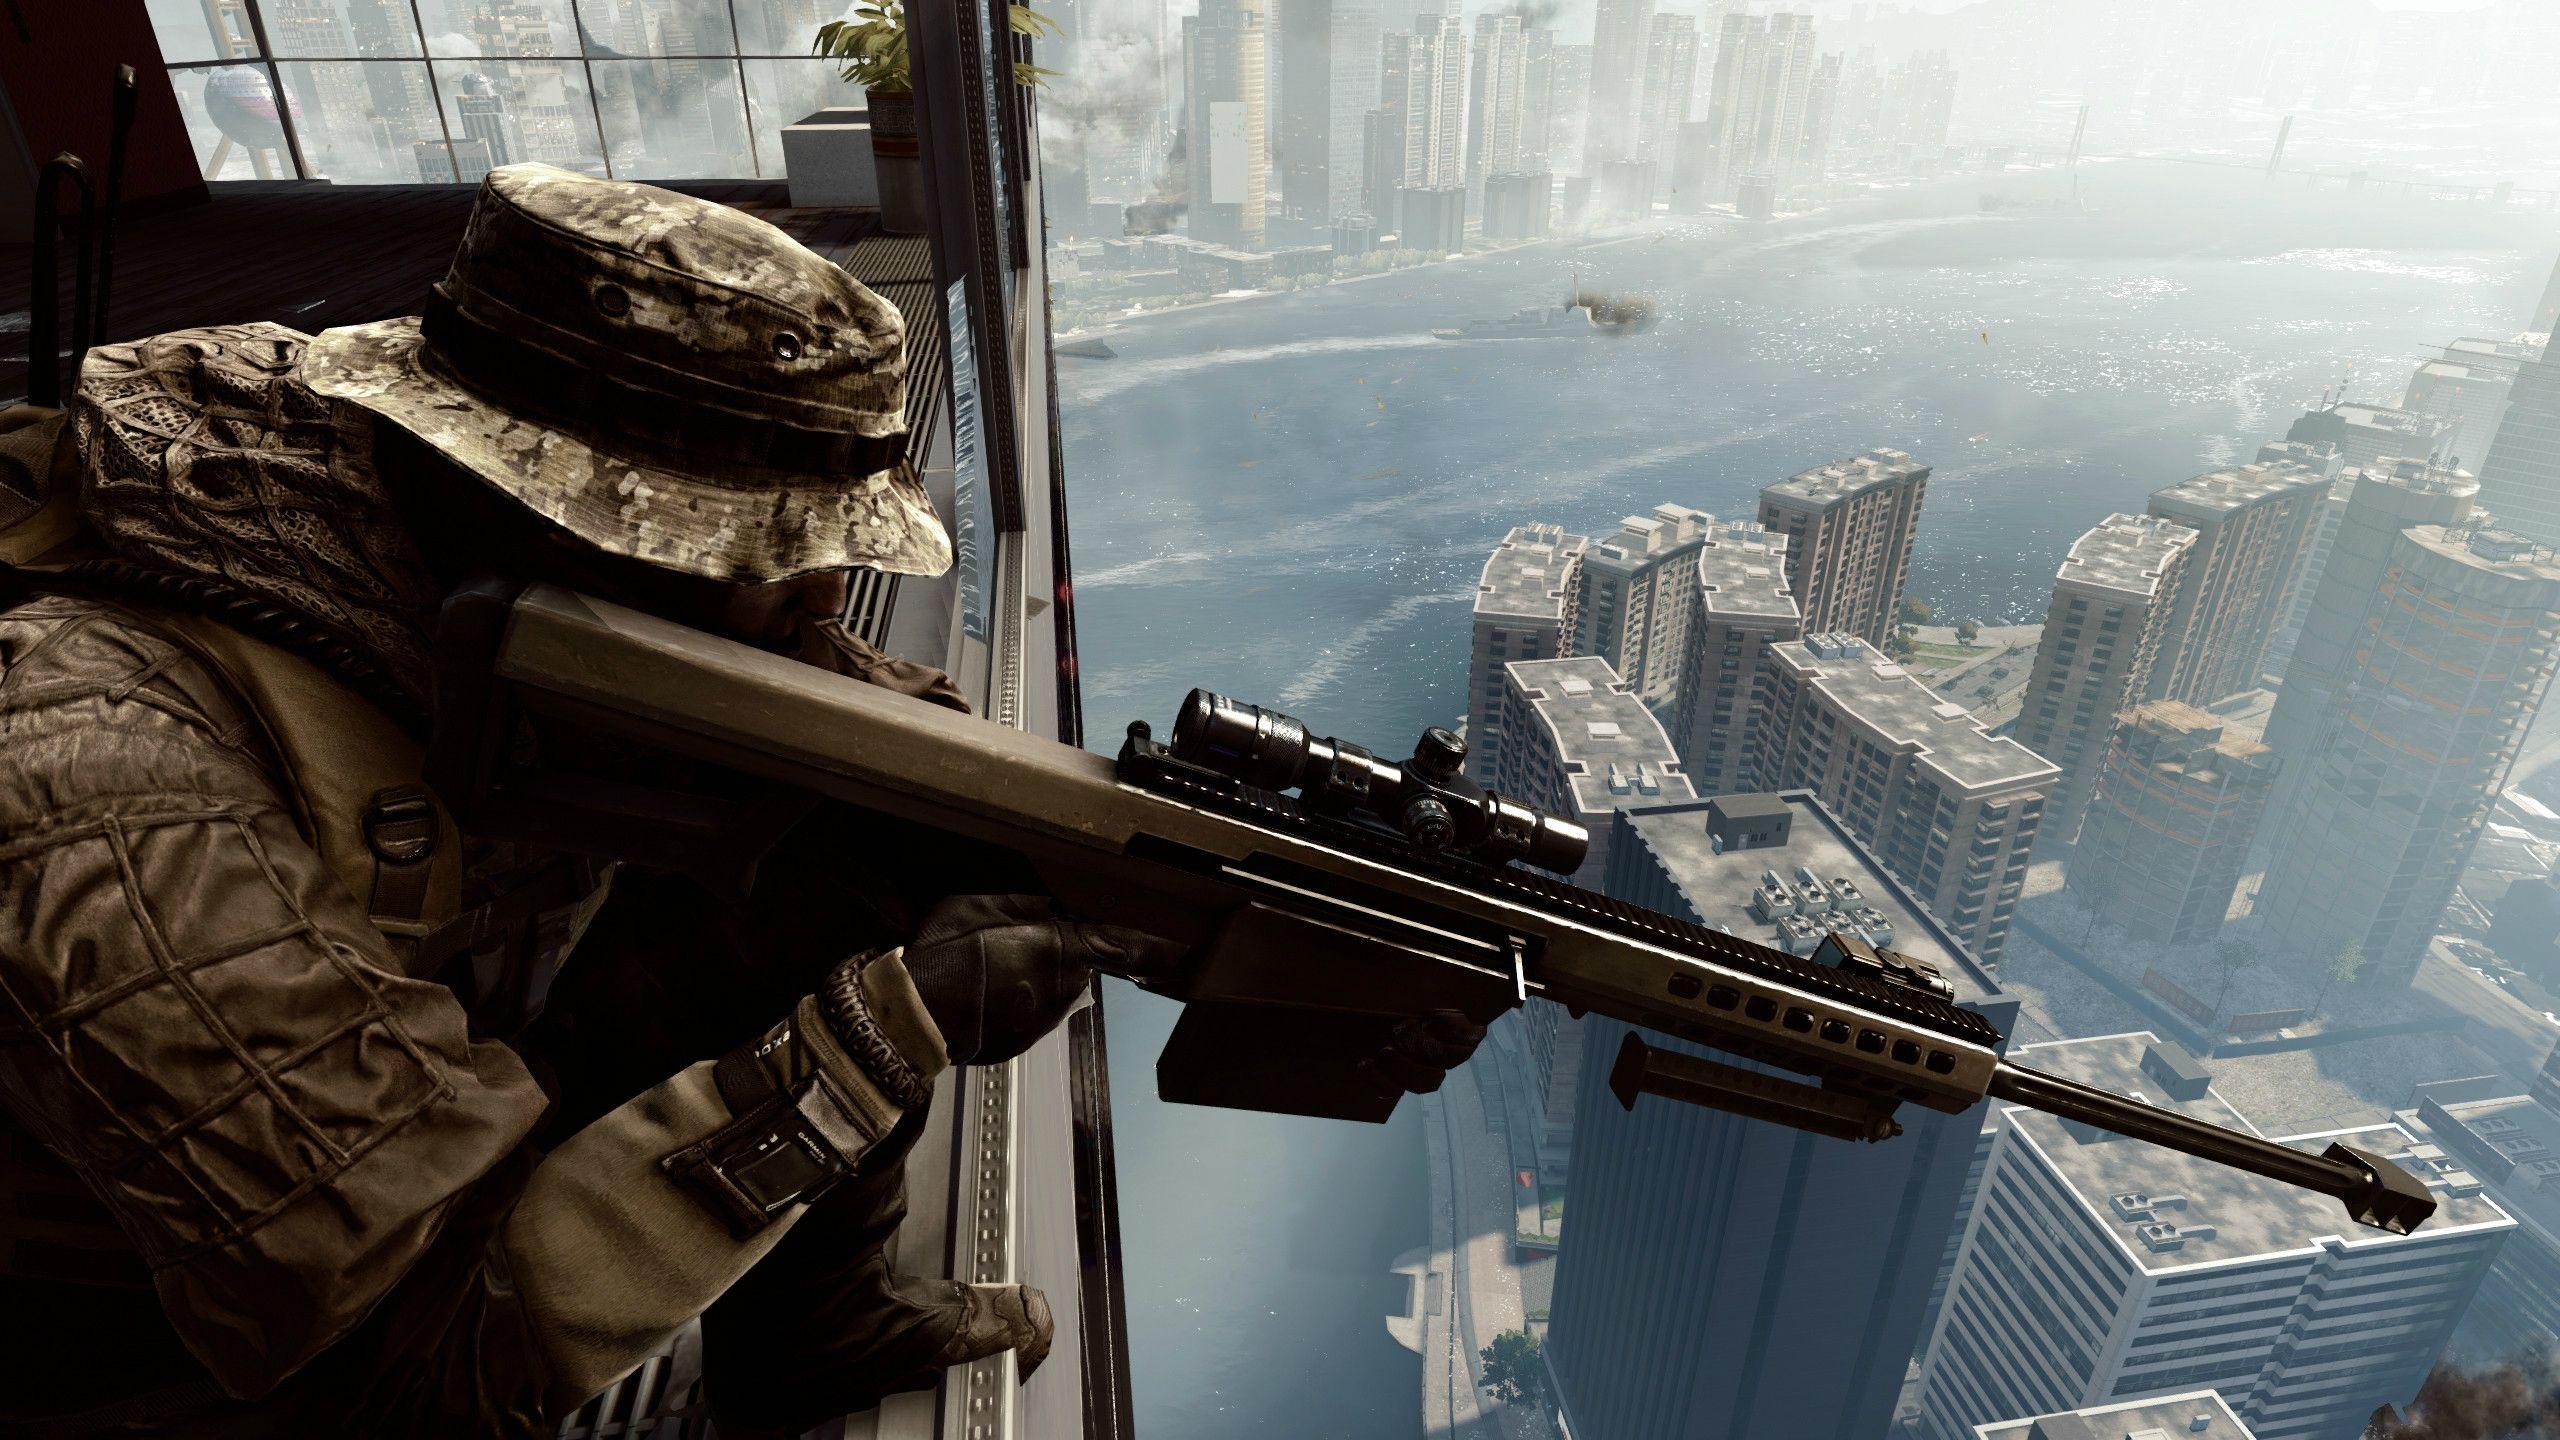 Battlefield 4 HD Wallpaper | Background Image | 2560x1440 | ID:688206 - Wallpaper Abyss